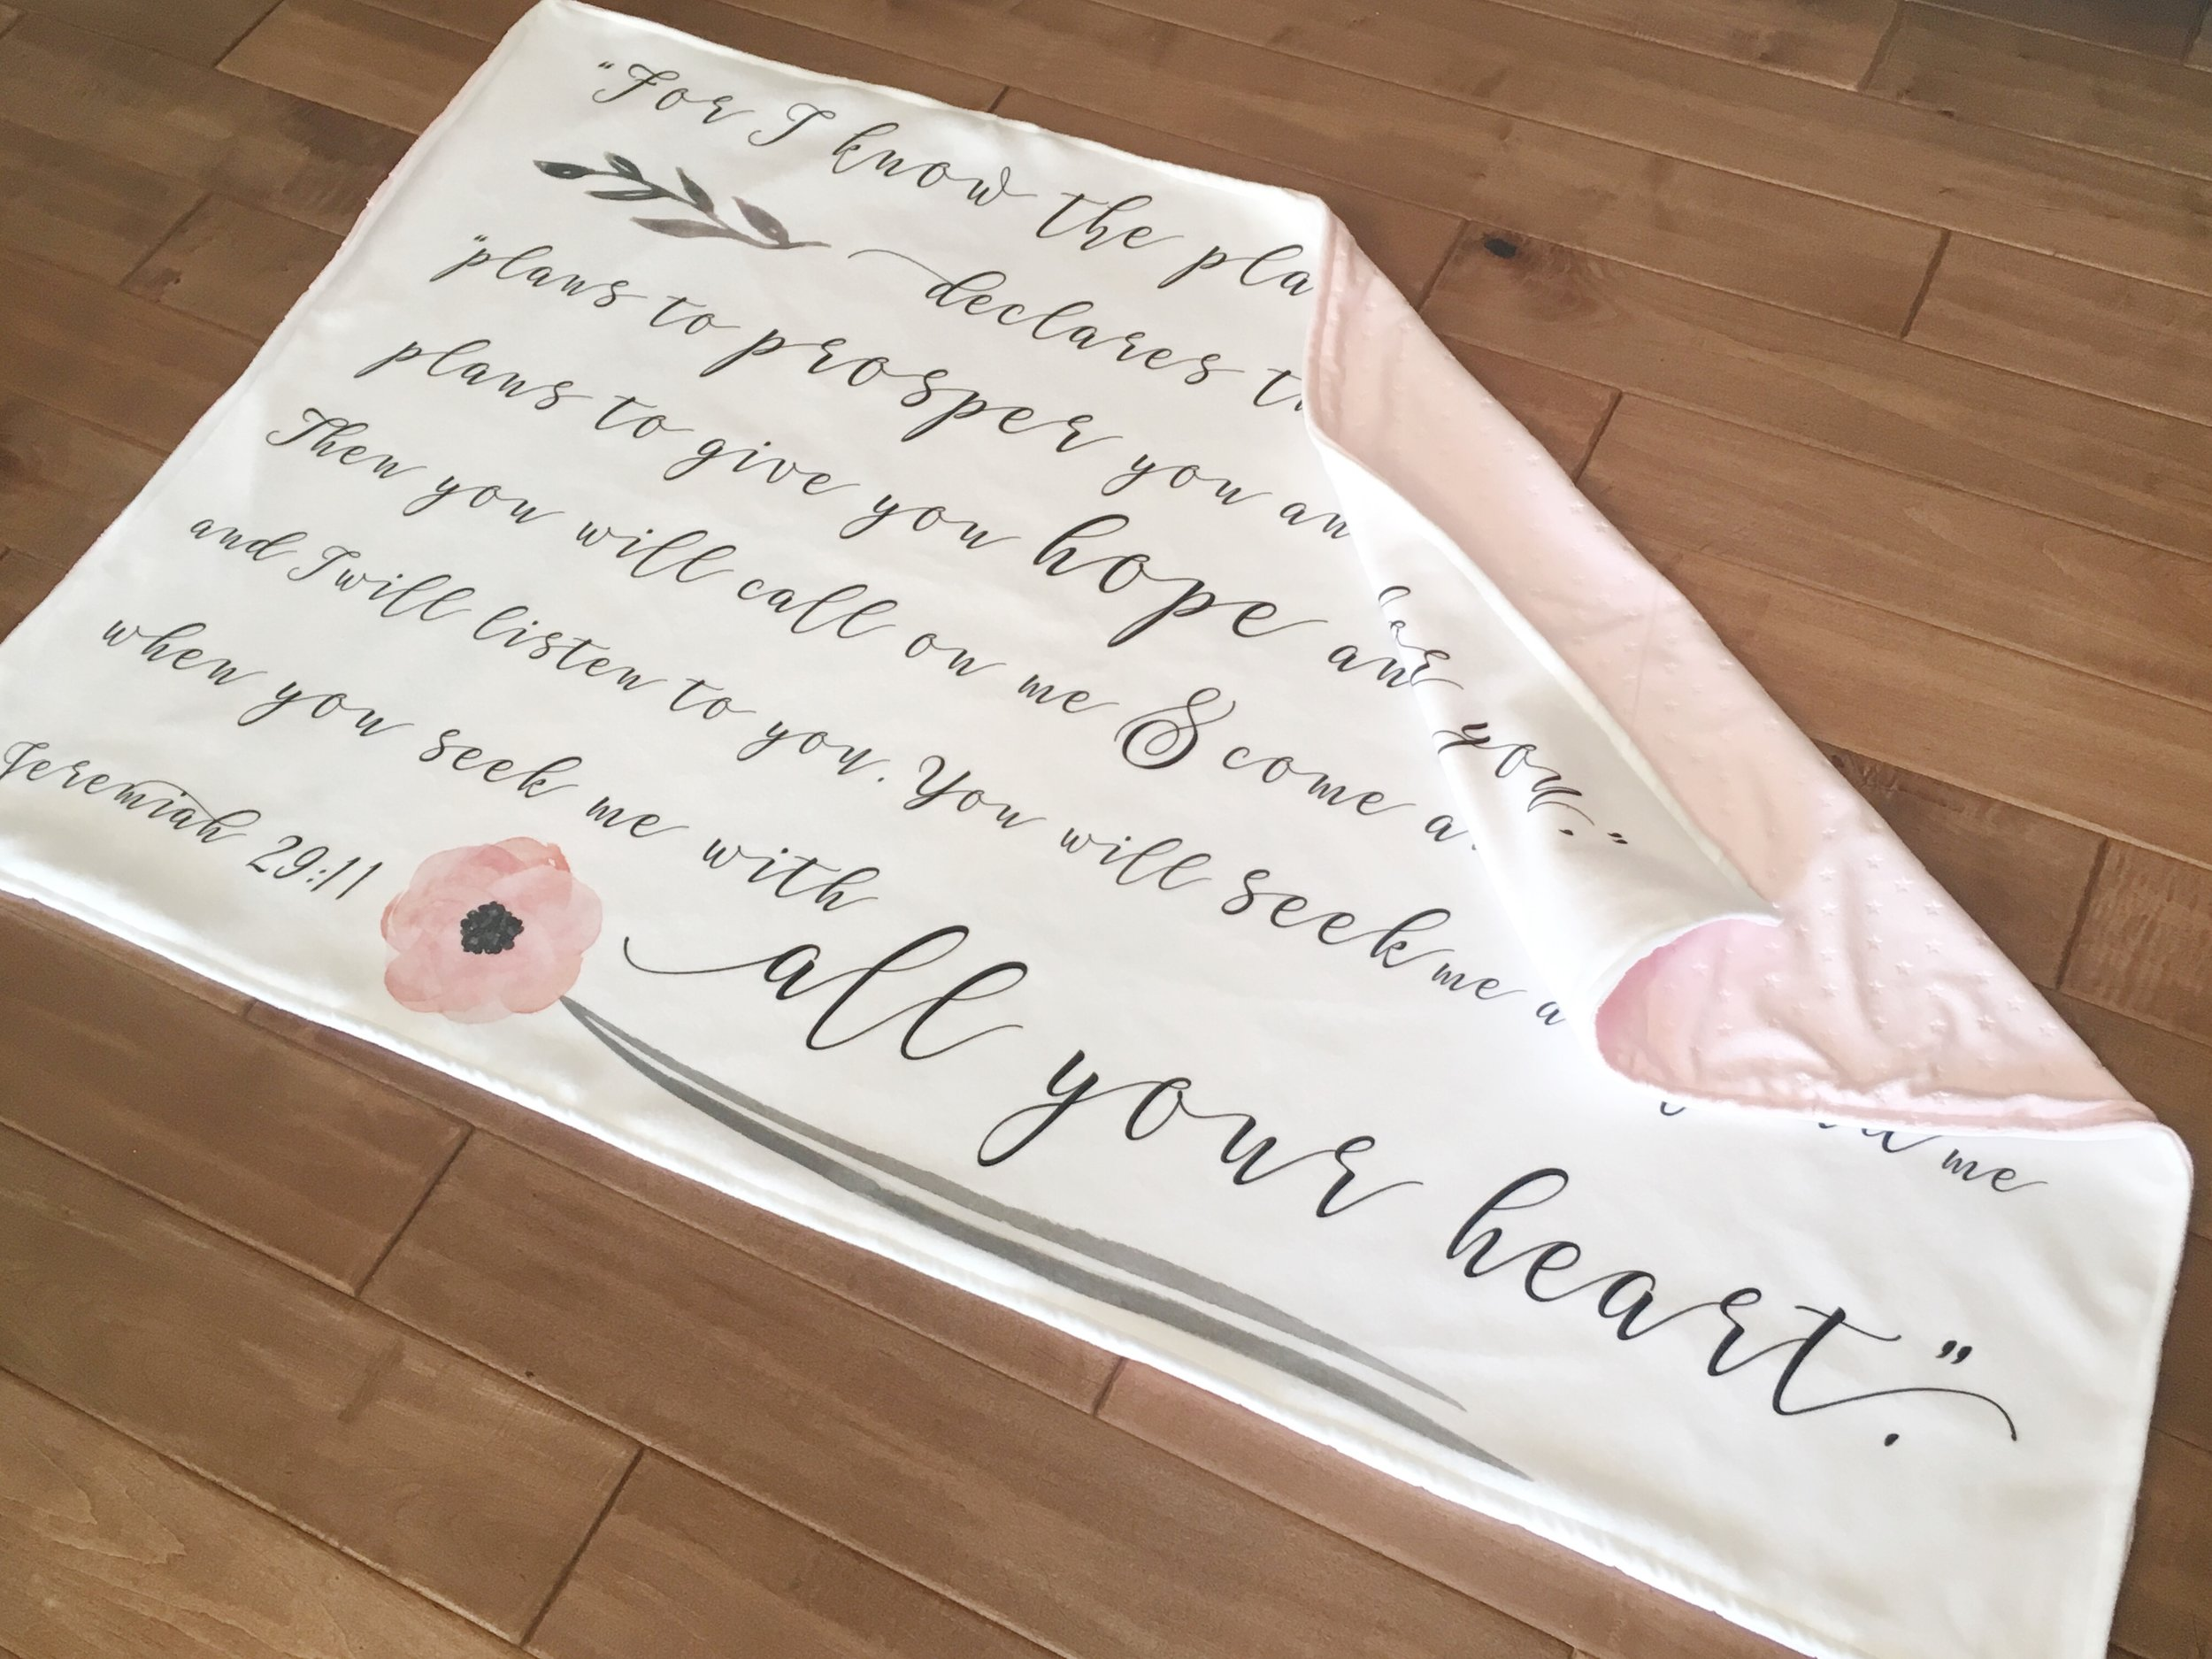 Central PA, Baby Blanket, Hand lettered, JesSmith Designs, Invitations, custom-01-28 13.43.00.jpg